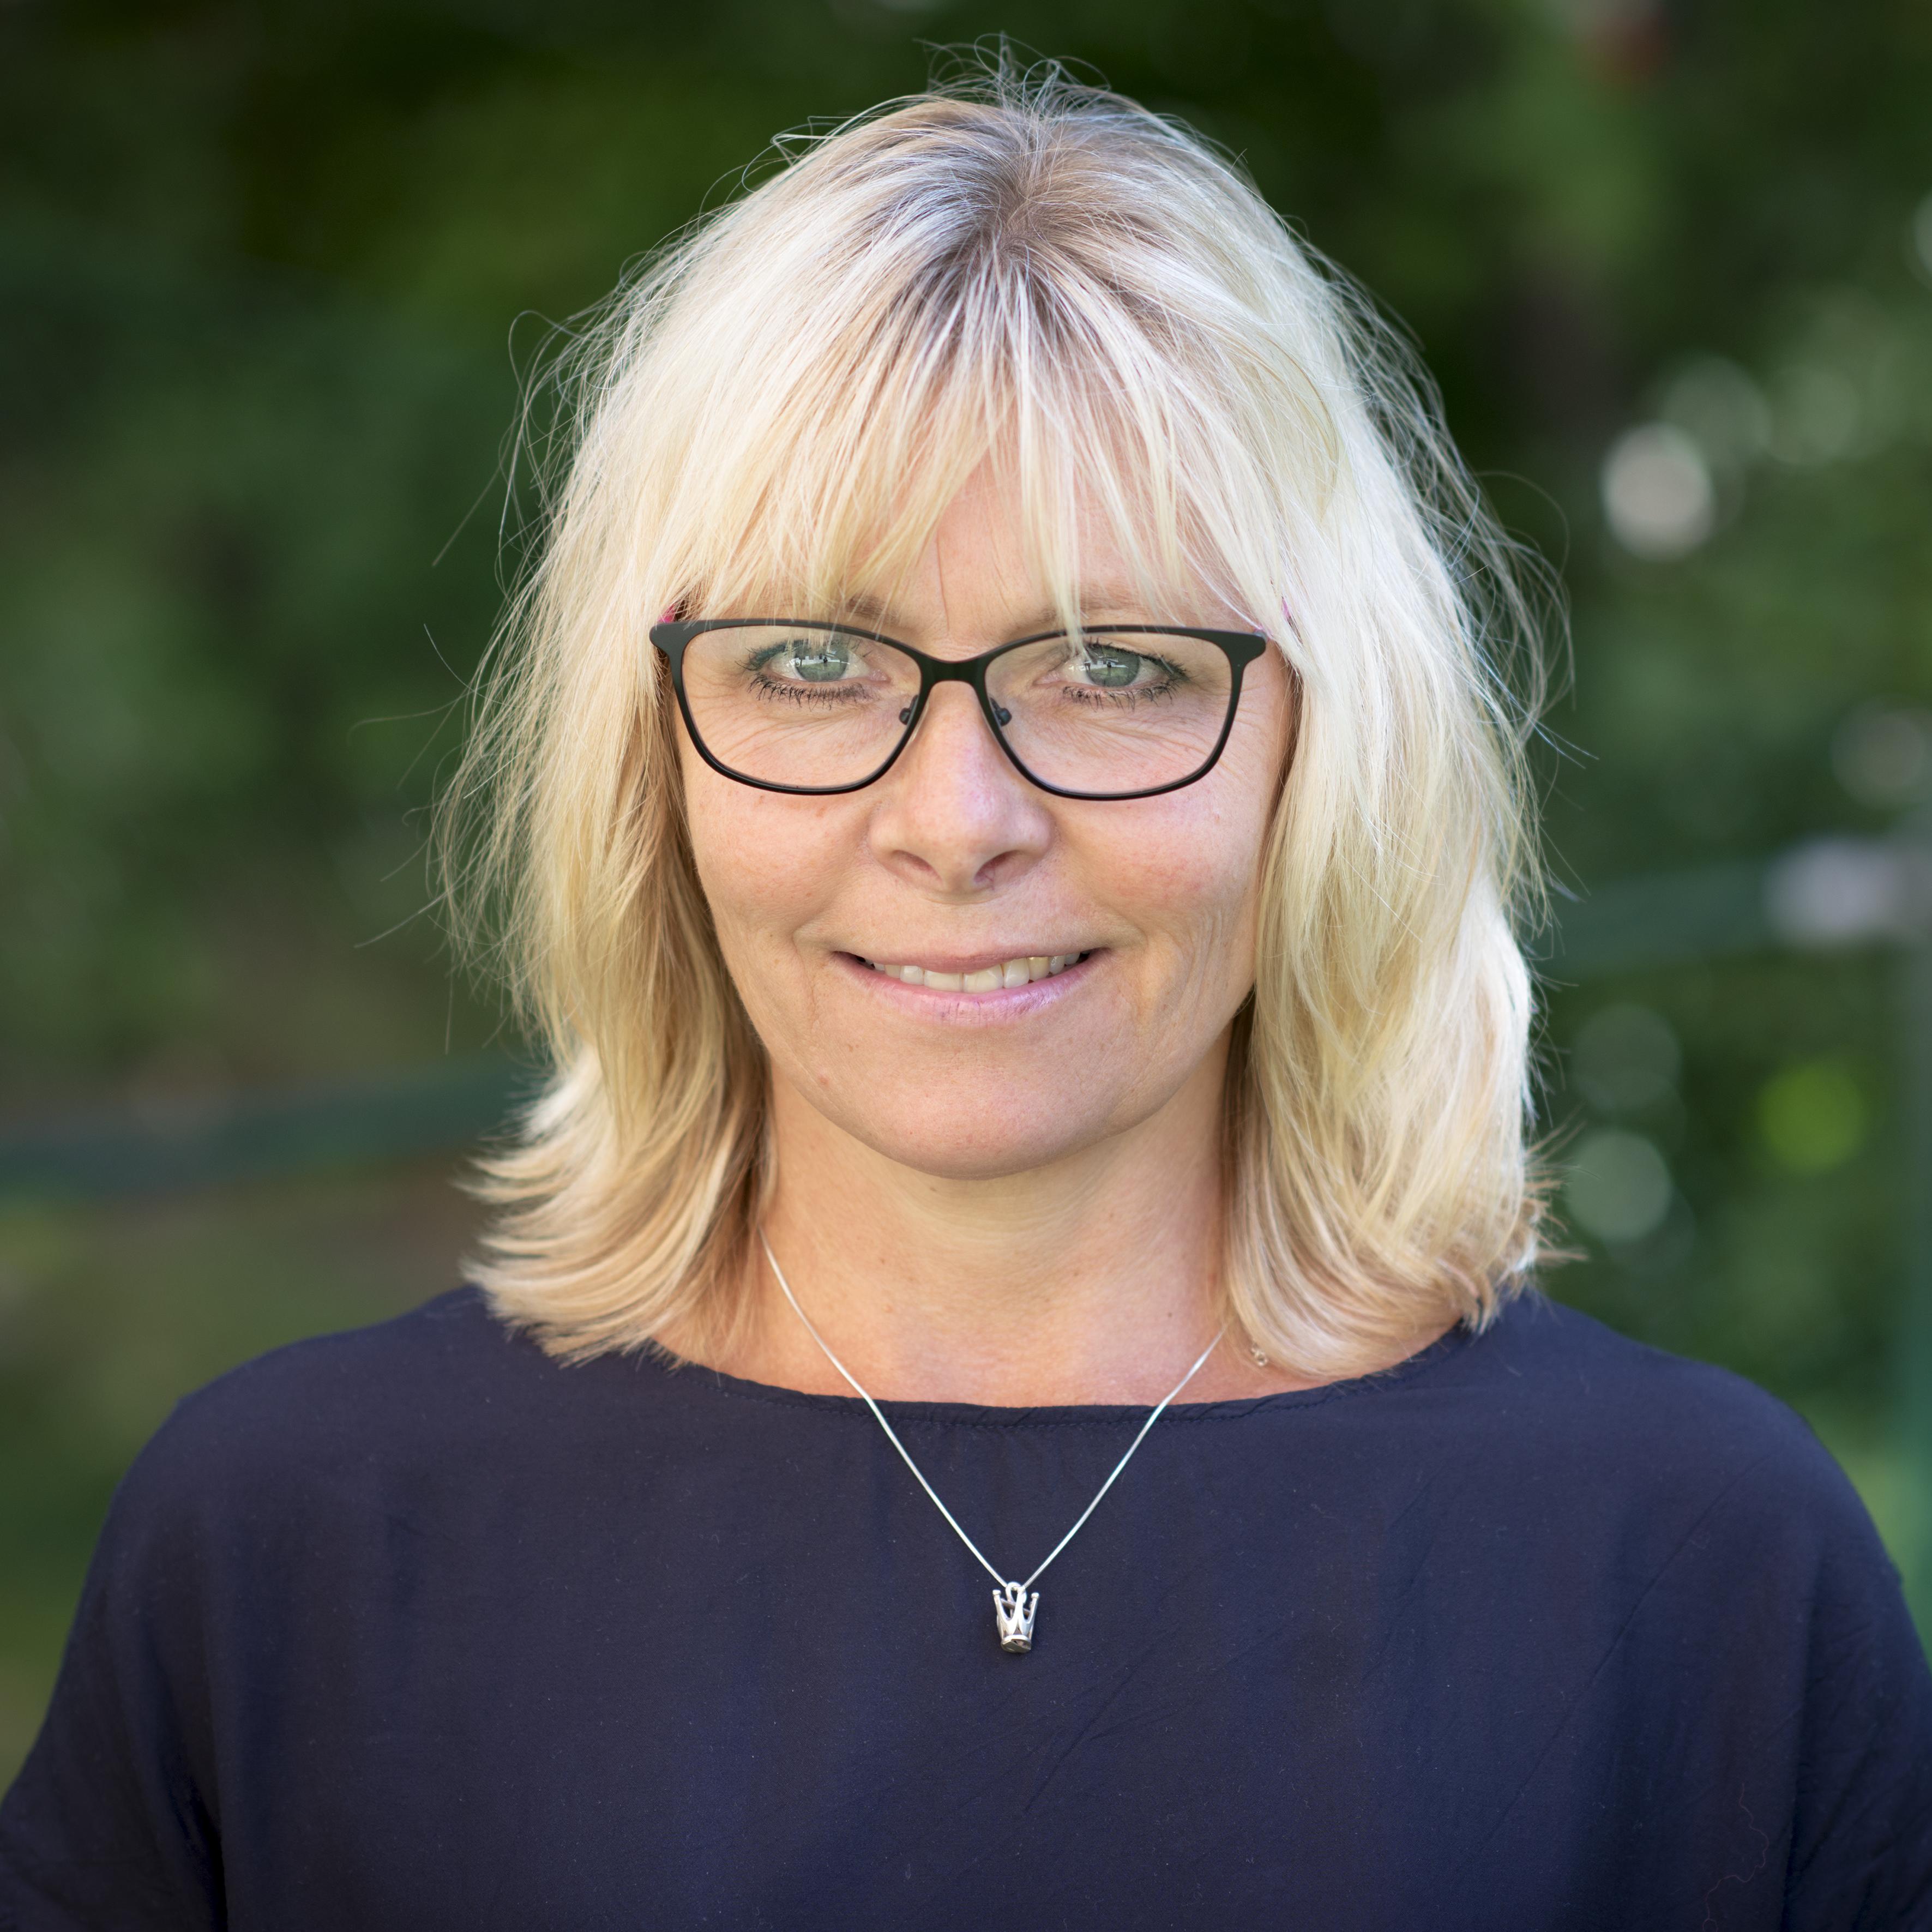 Nina Lööf-Johansson